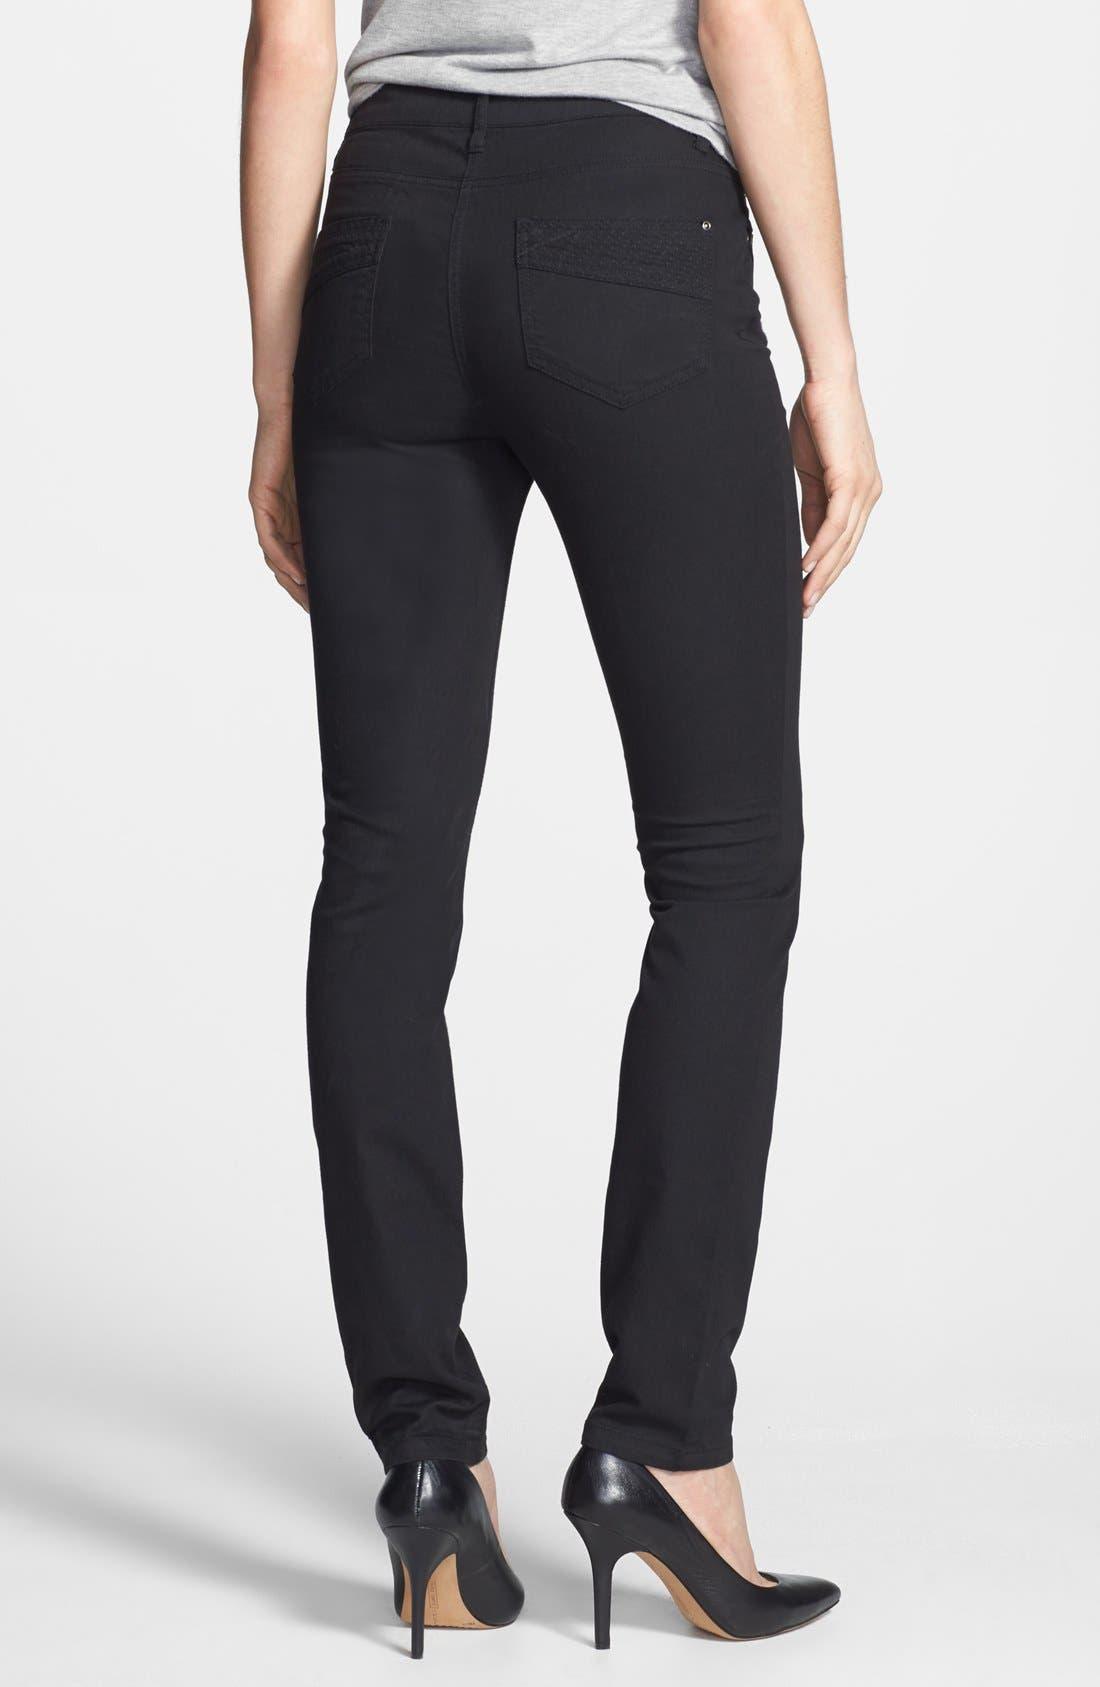 Alternate Image 2  - Wallis Stretch Skinny Jeans (Black)